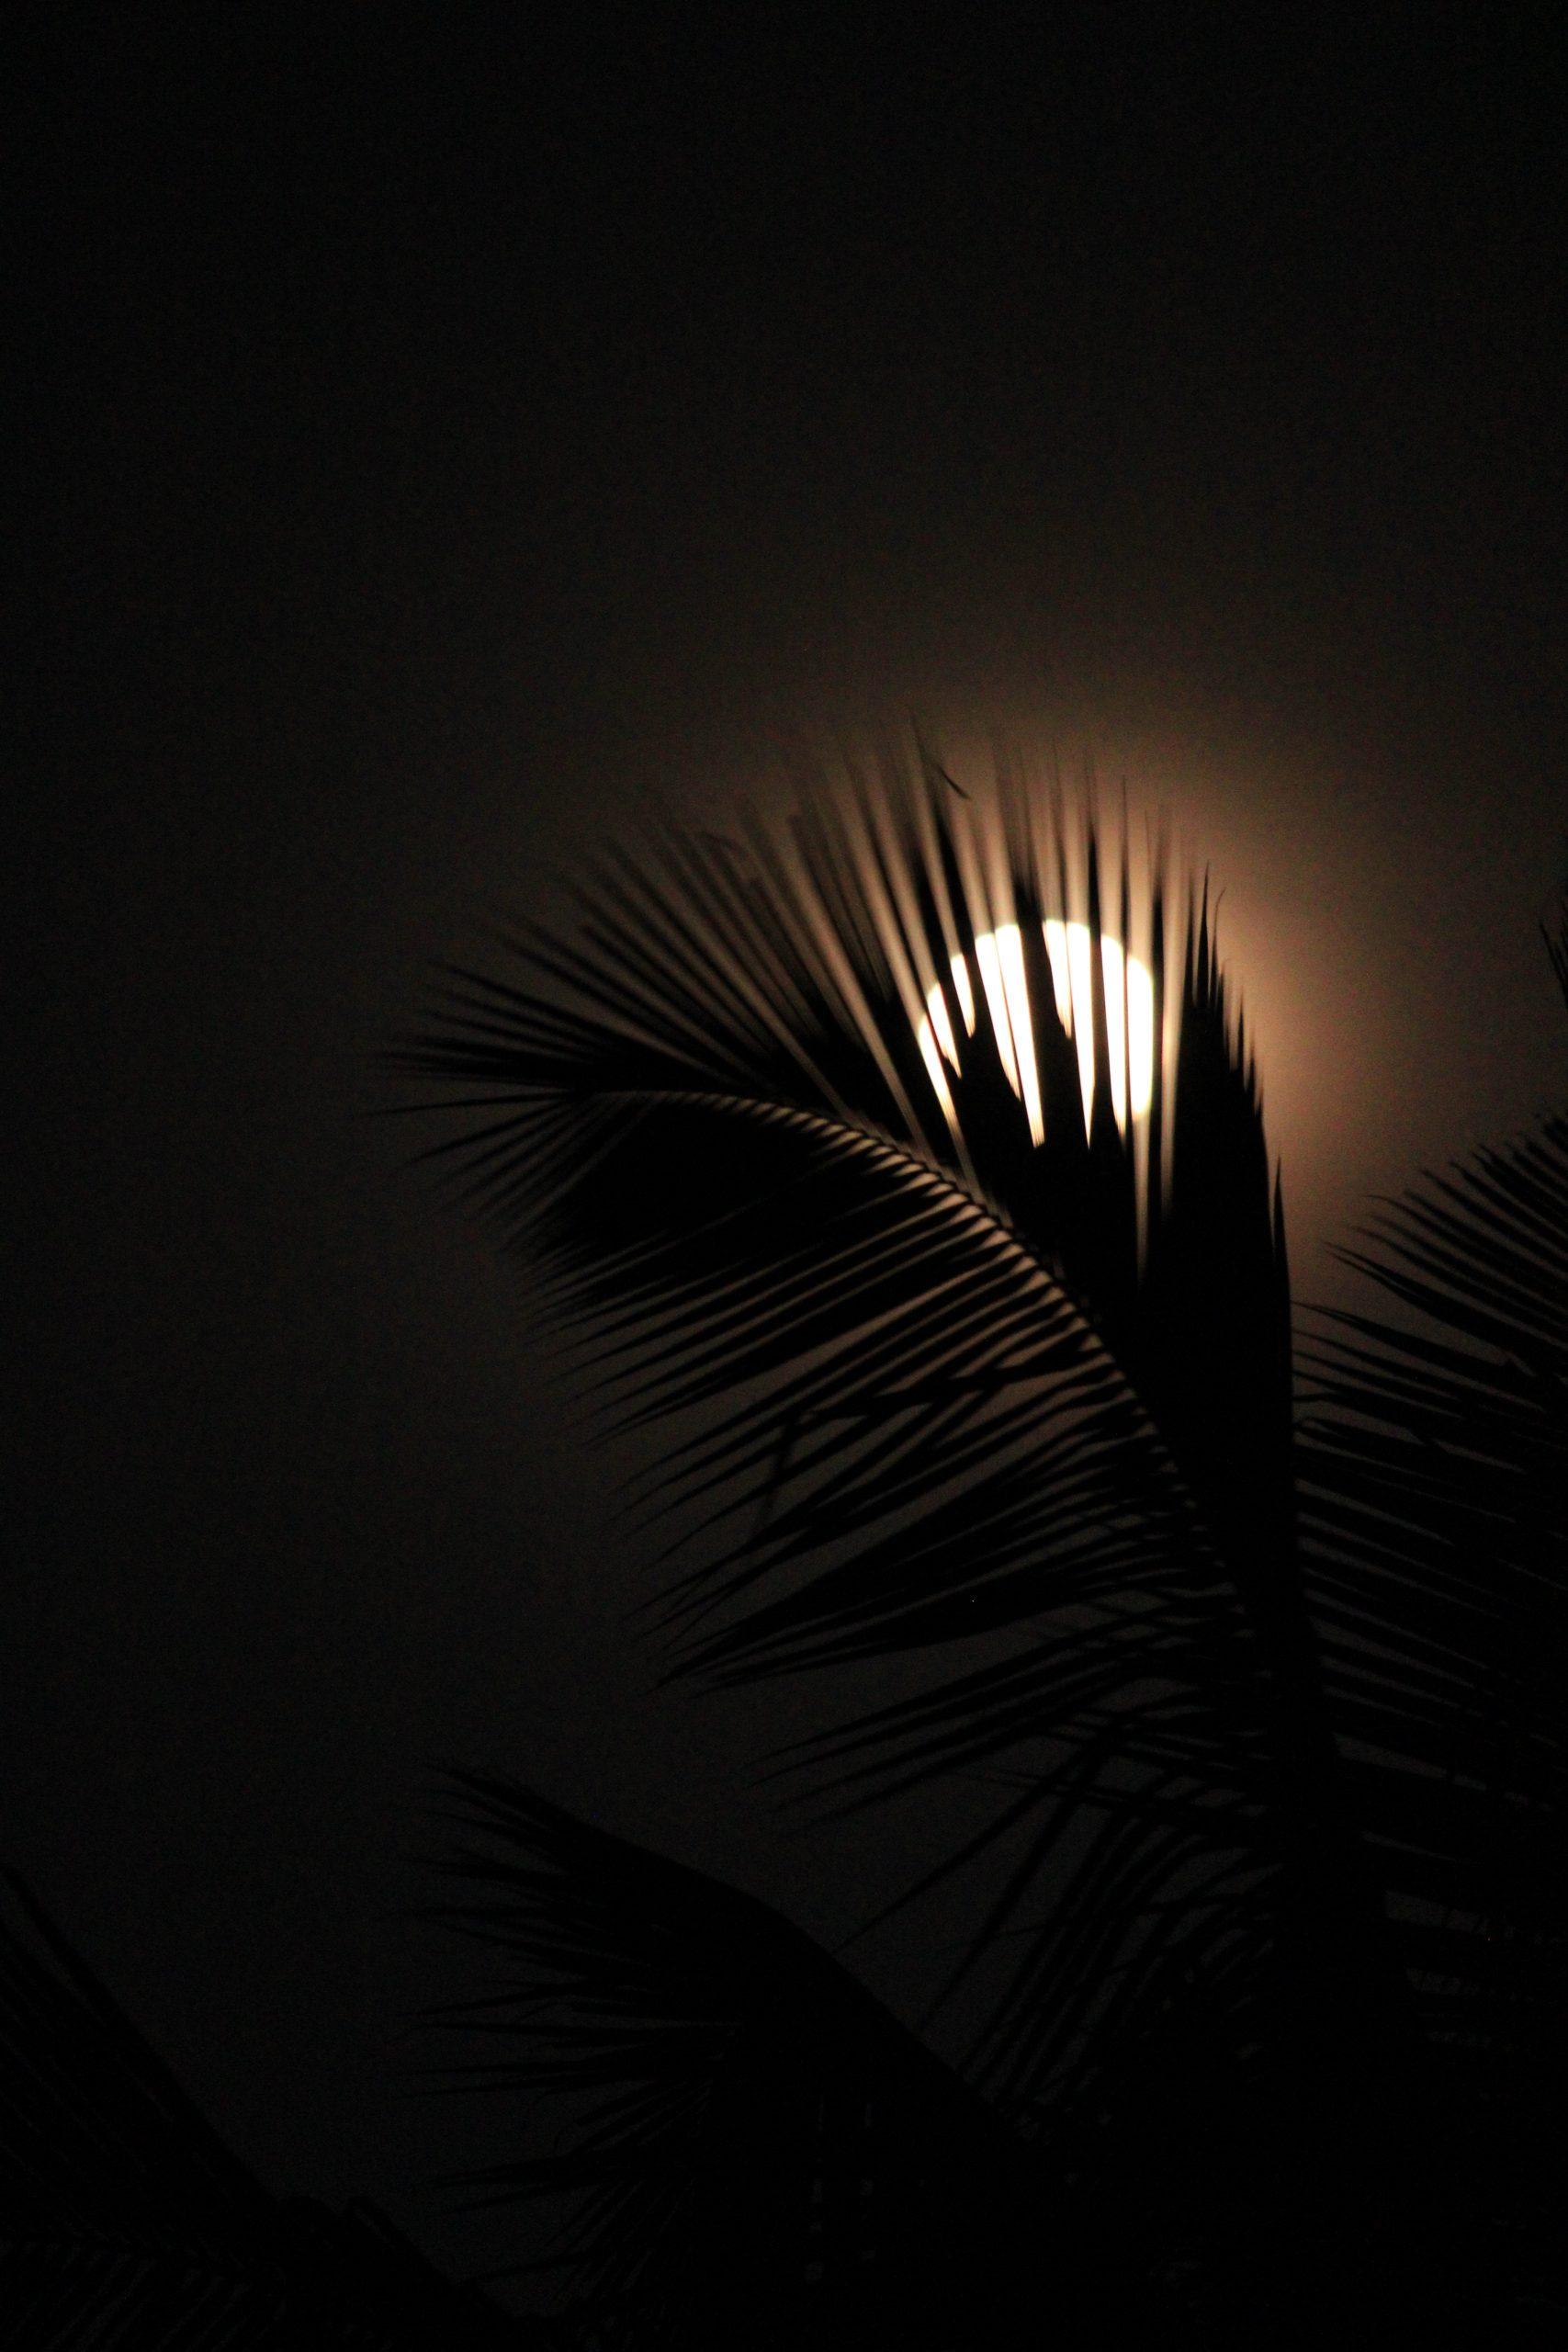 Moon view through the tree